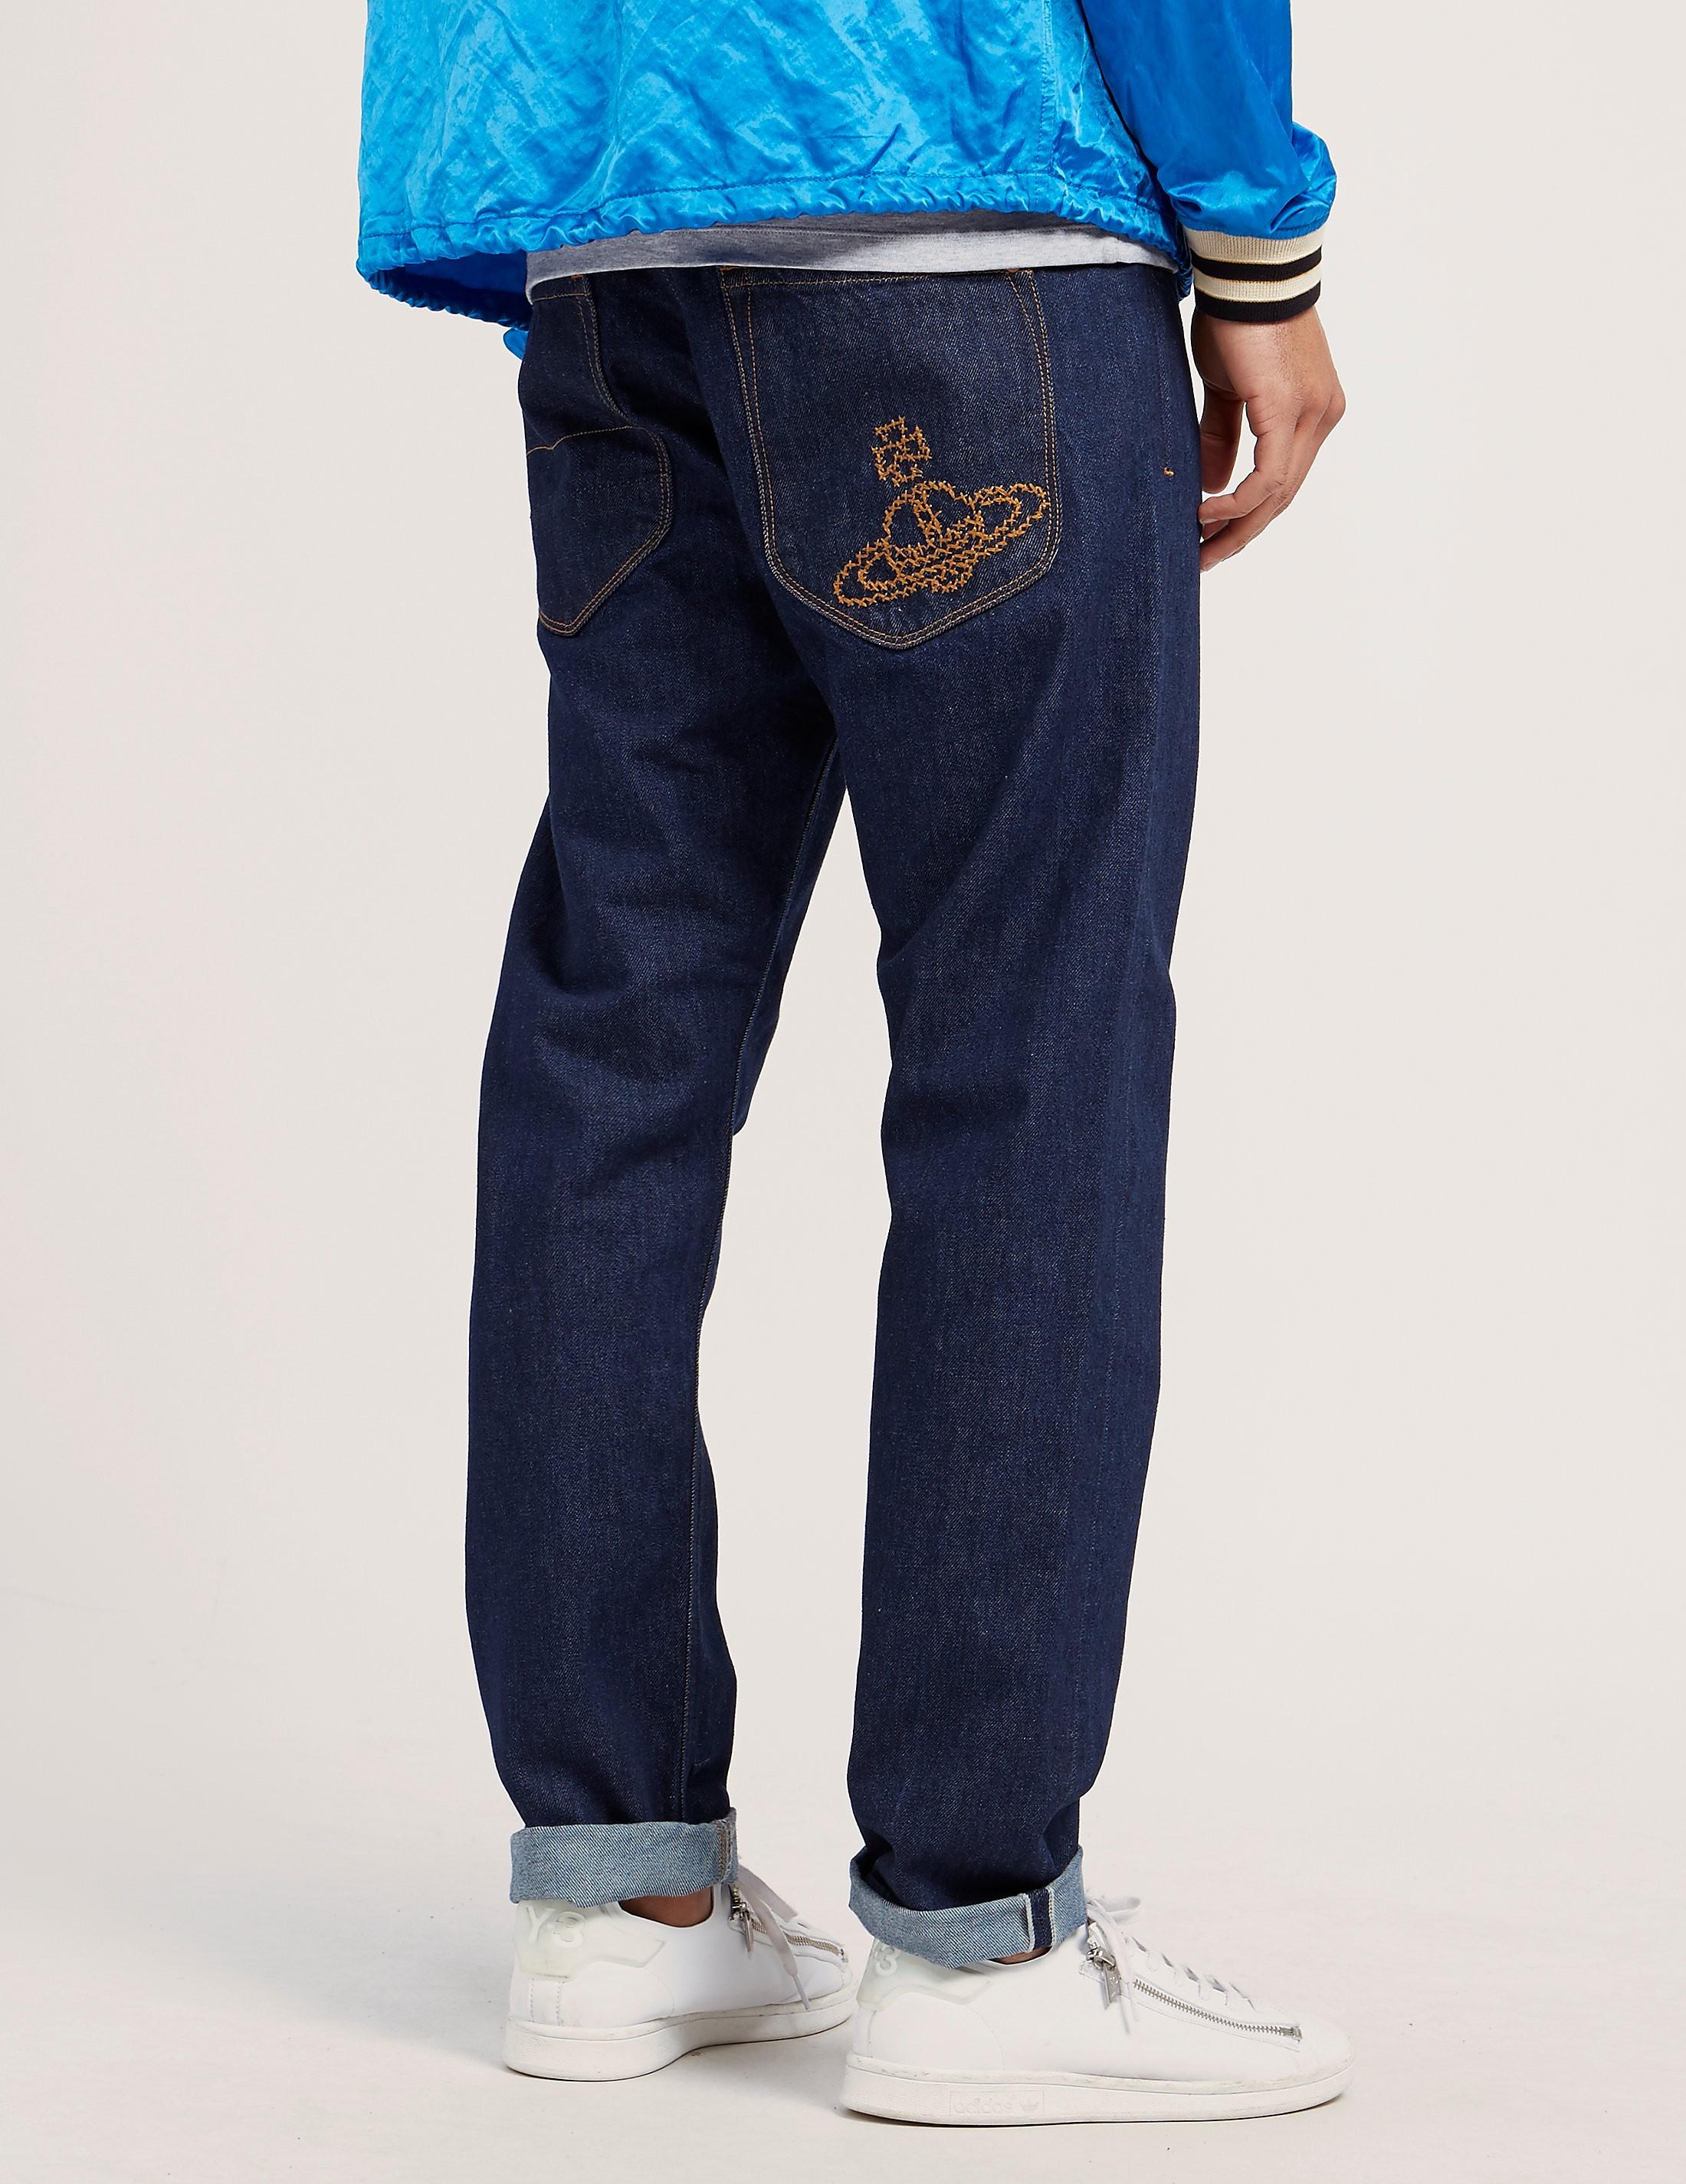 Vivienne Westwood Angmomania Johnstone Jeans